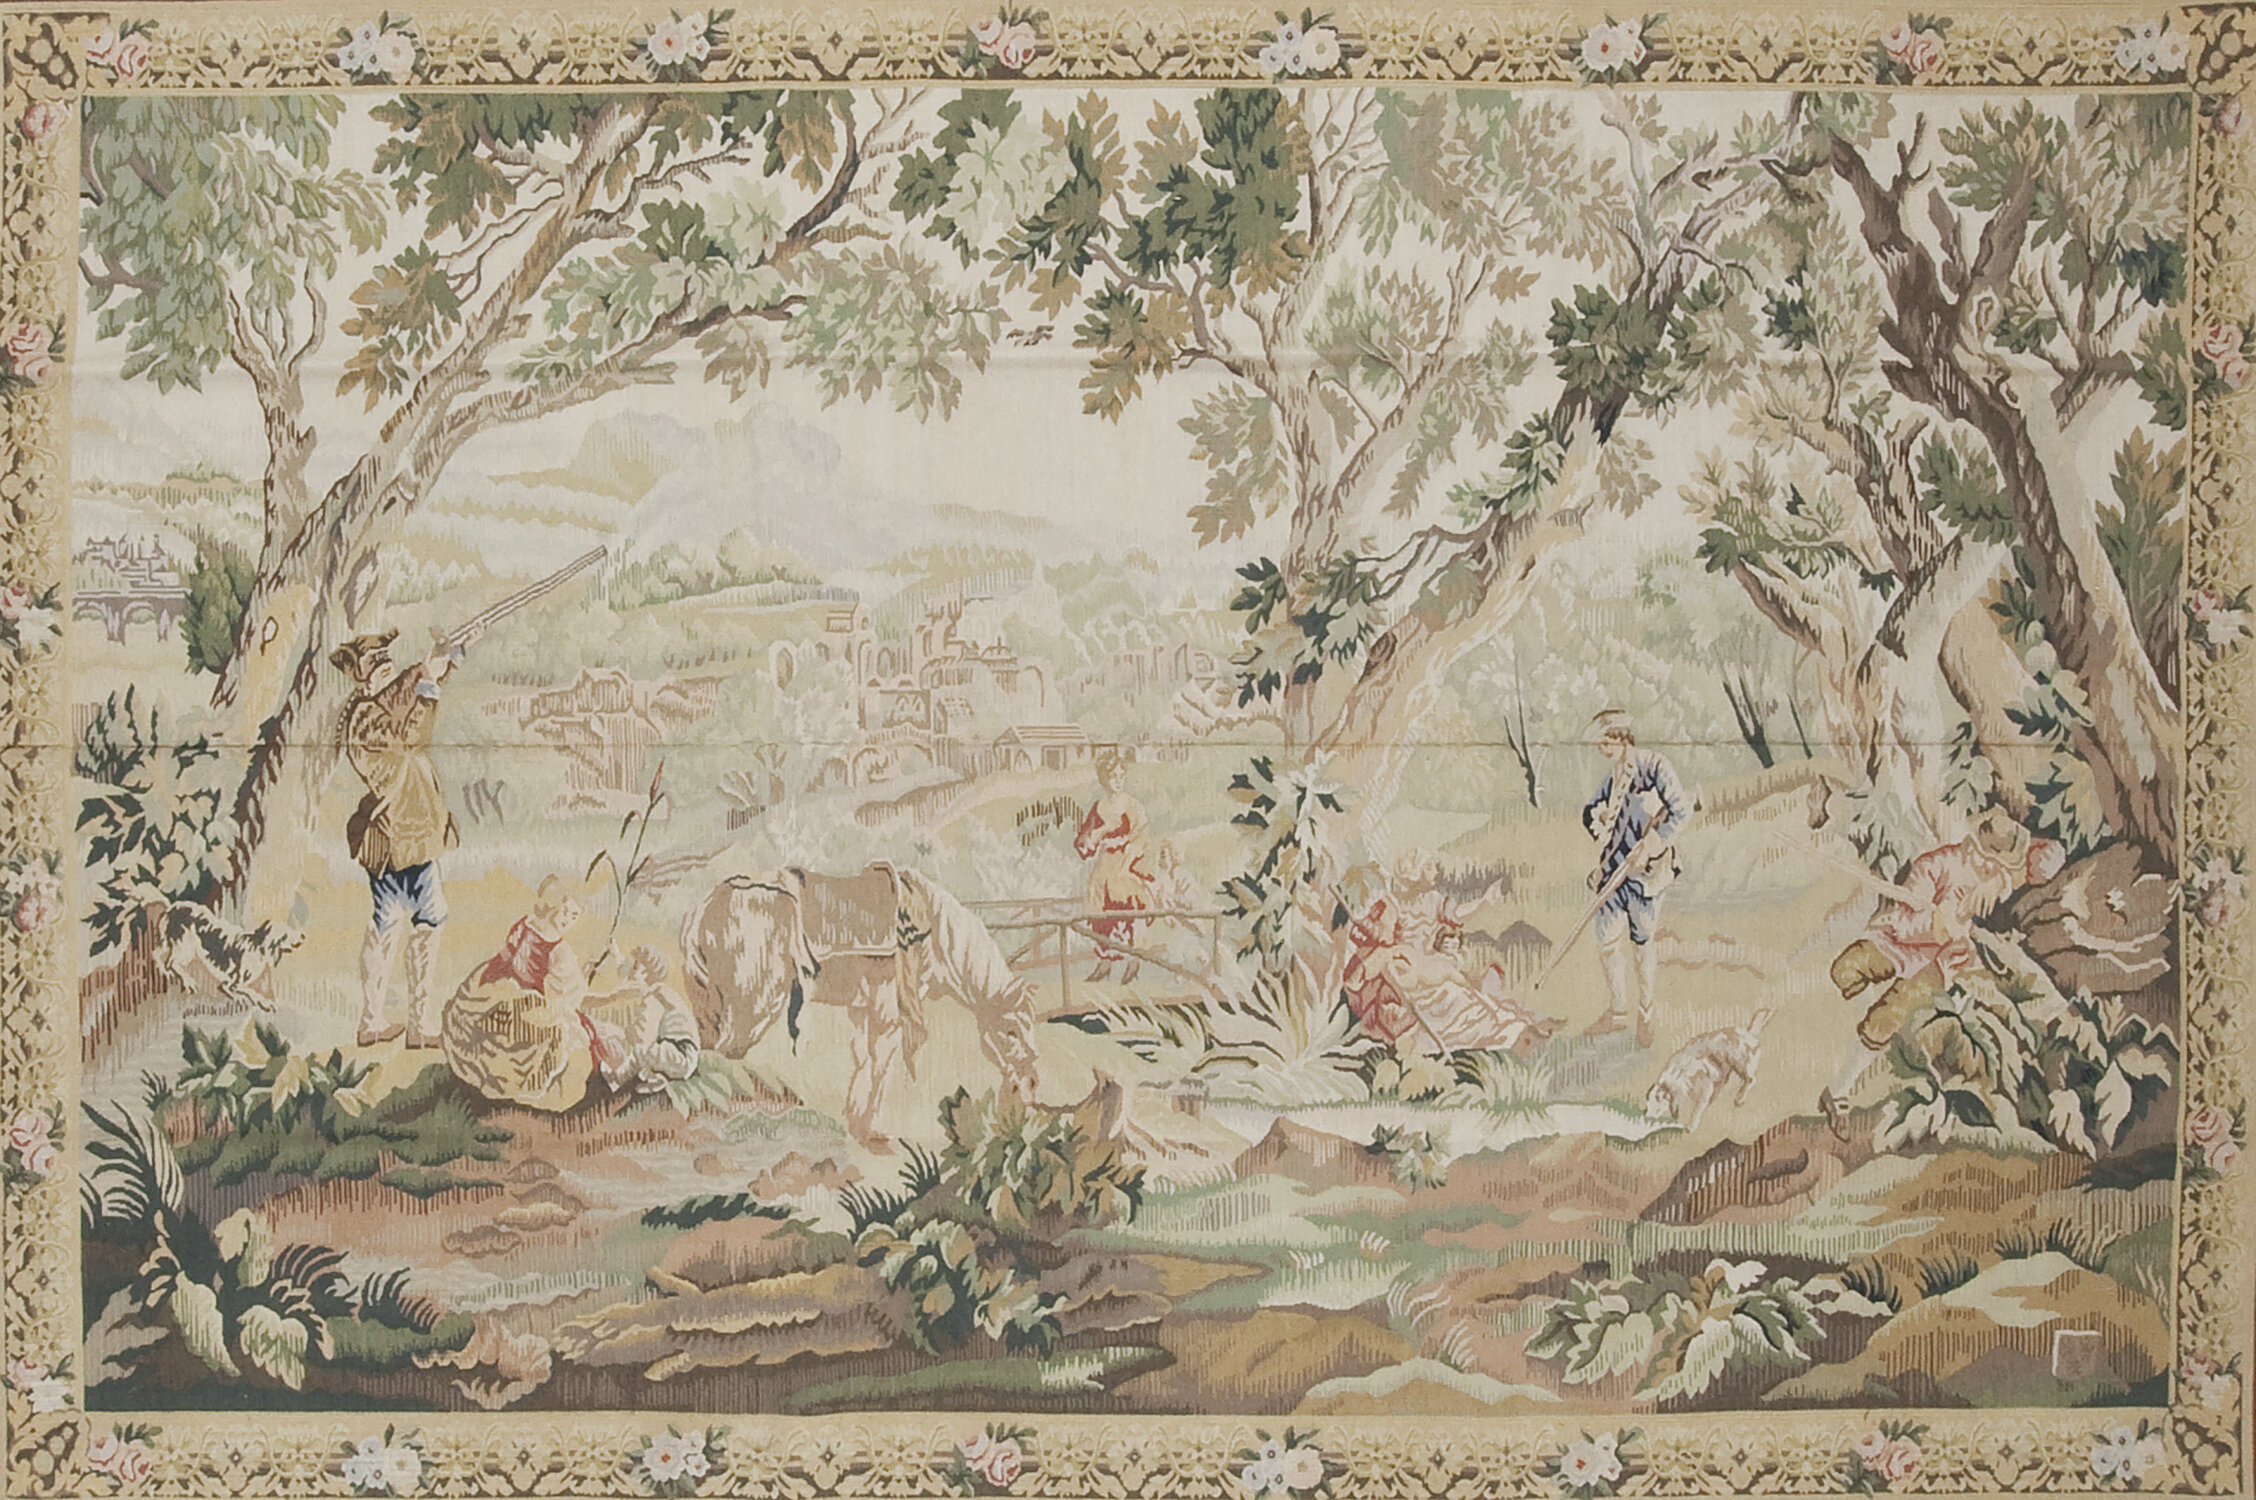 Large 33 40 Wool Tapestries You Ll Love In 2021 Wayfair